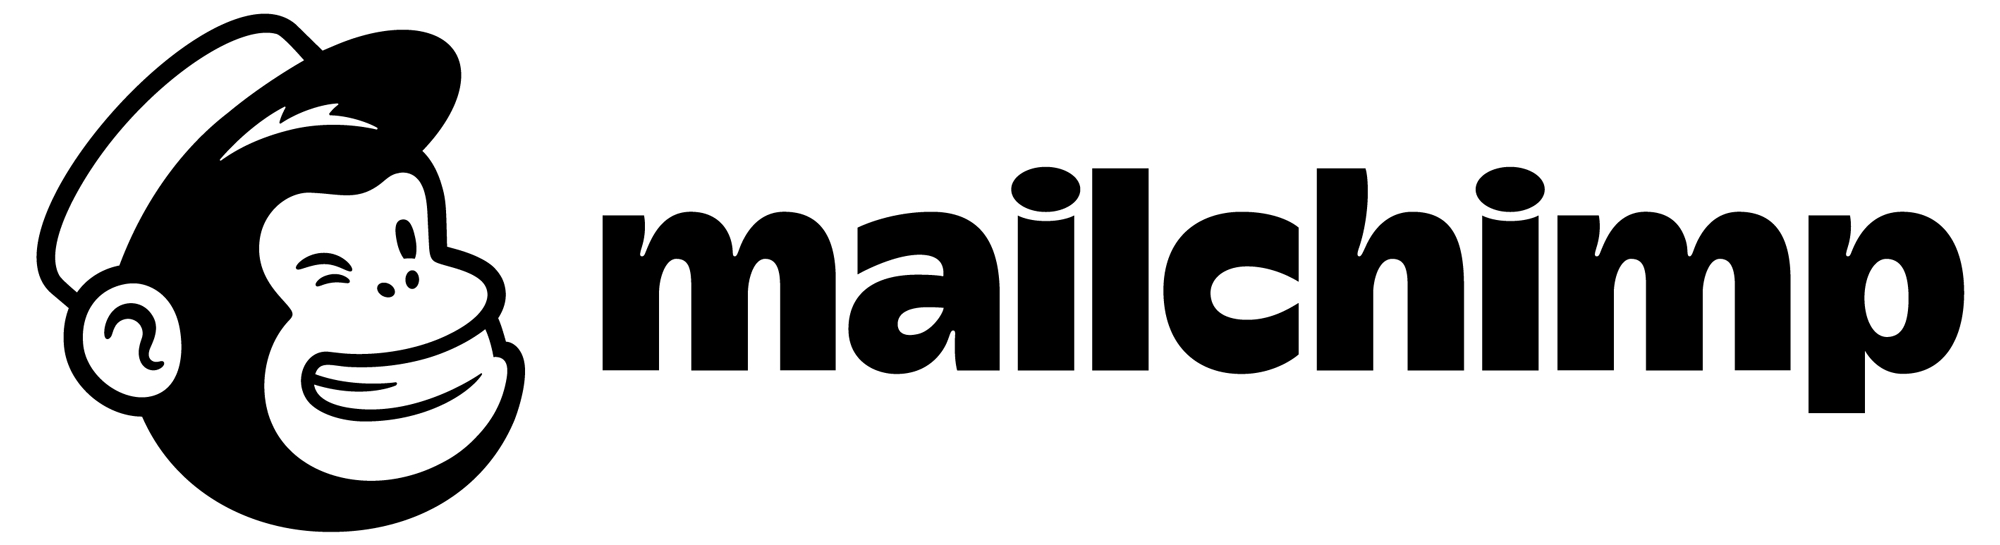 MailChimp - best crm for shopify